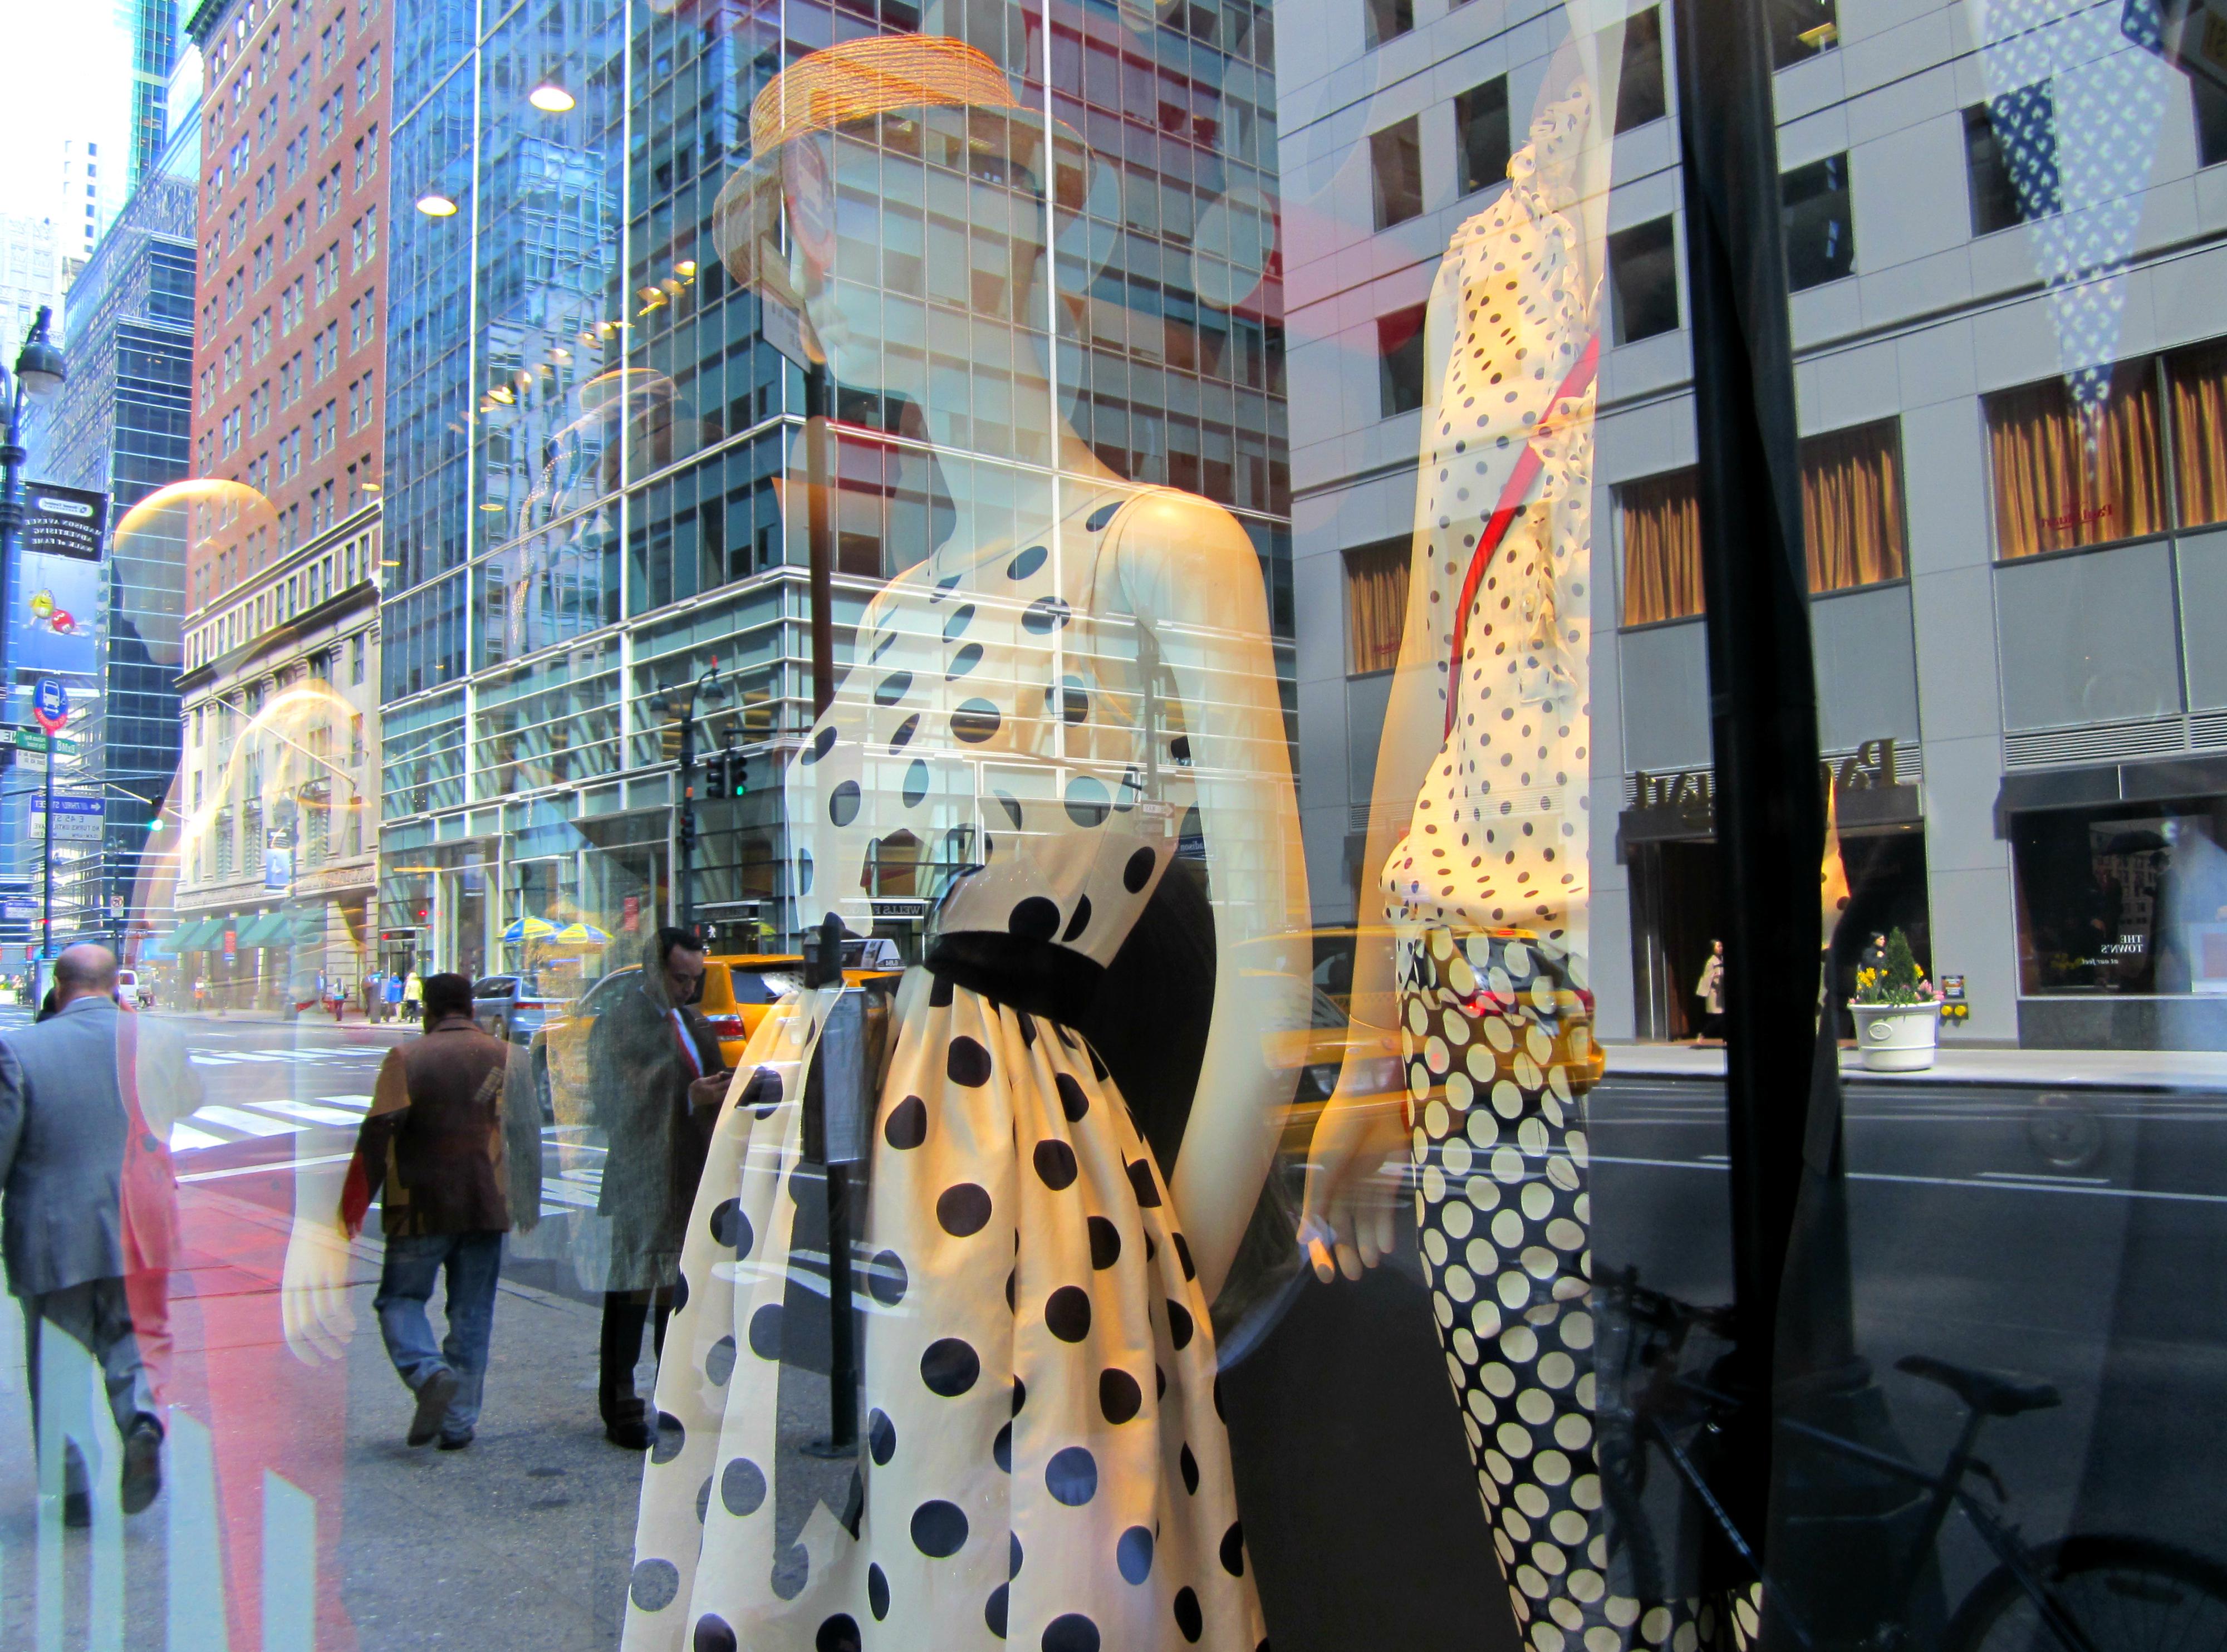 Hintergrundbilder : Newyorkcity, USA, New York, Betrachtung, Gebäude ...